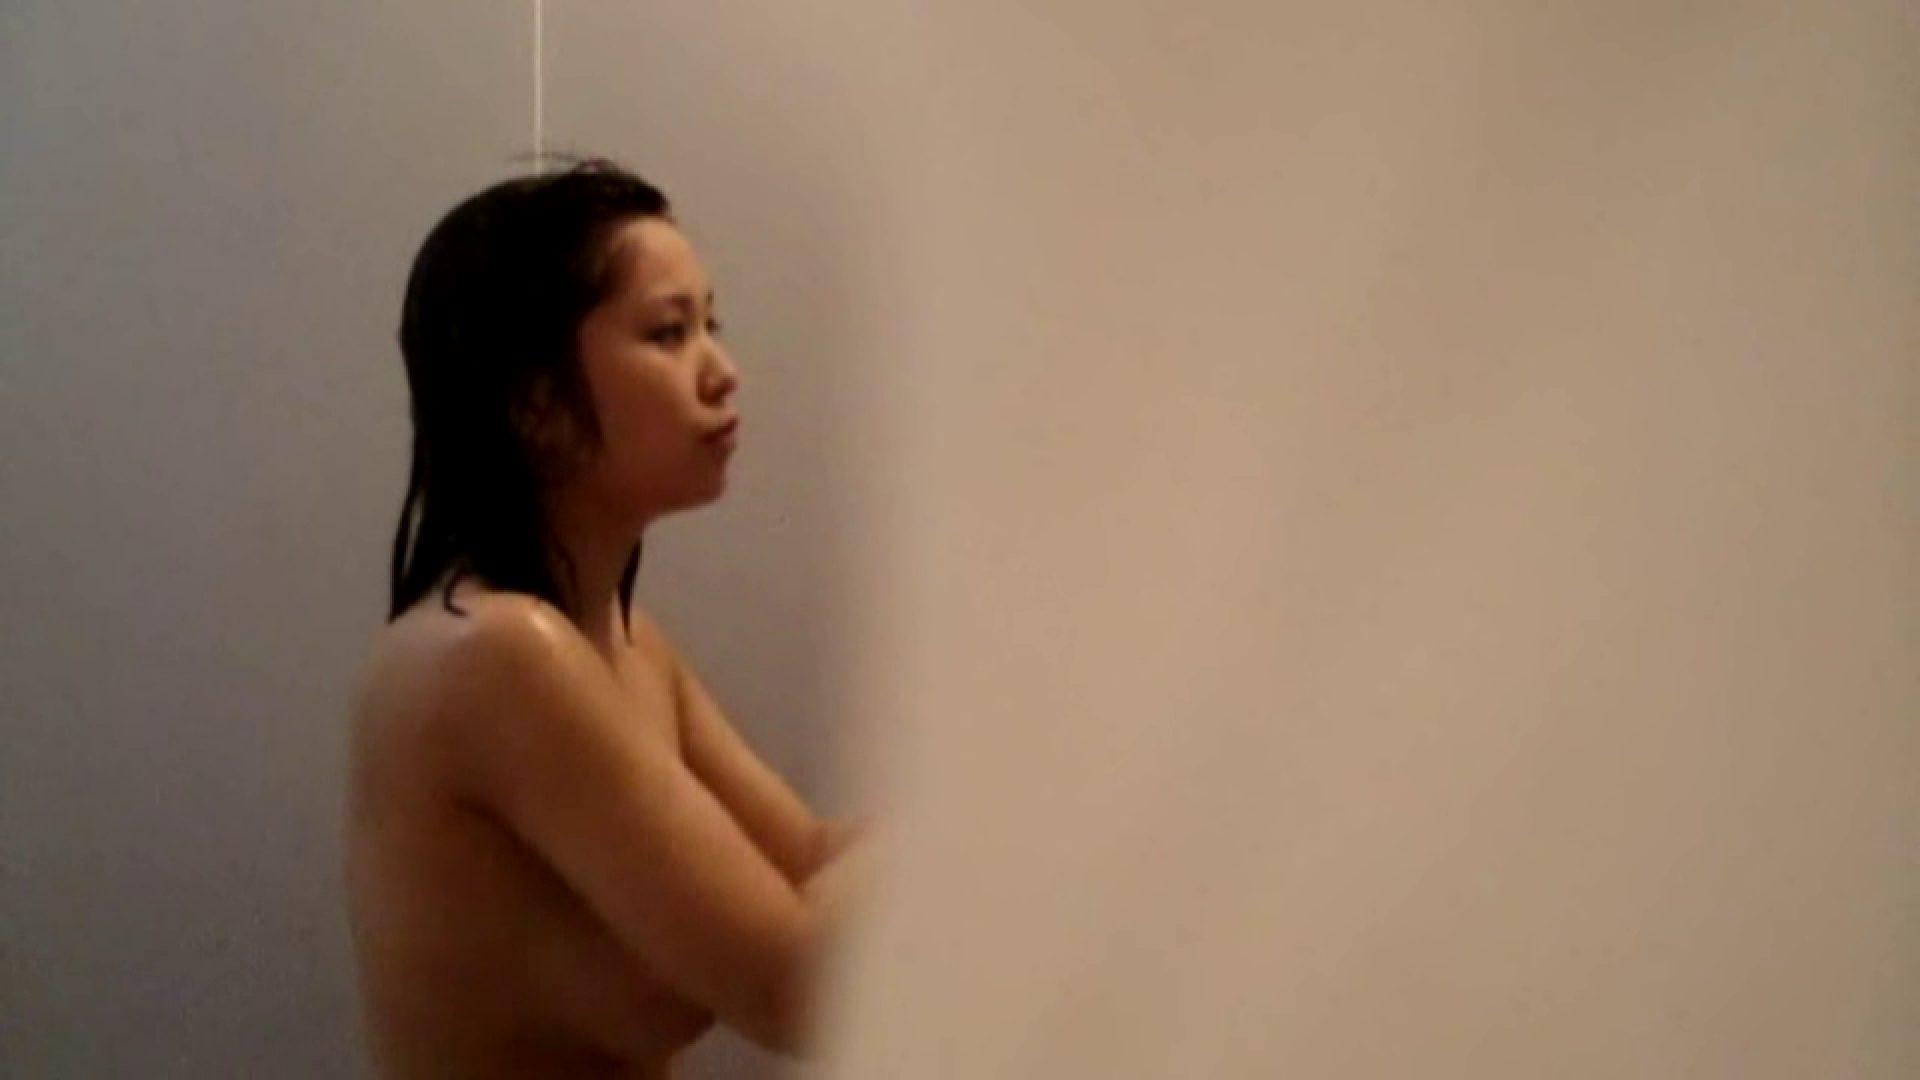 vol.2 葵のグラドル顔負けの爆乳を入浴シーンでどうぞ。 ○族 すけべAV動画紹介 110枚 70